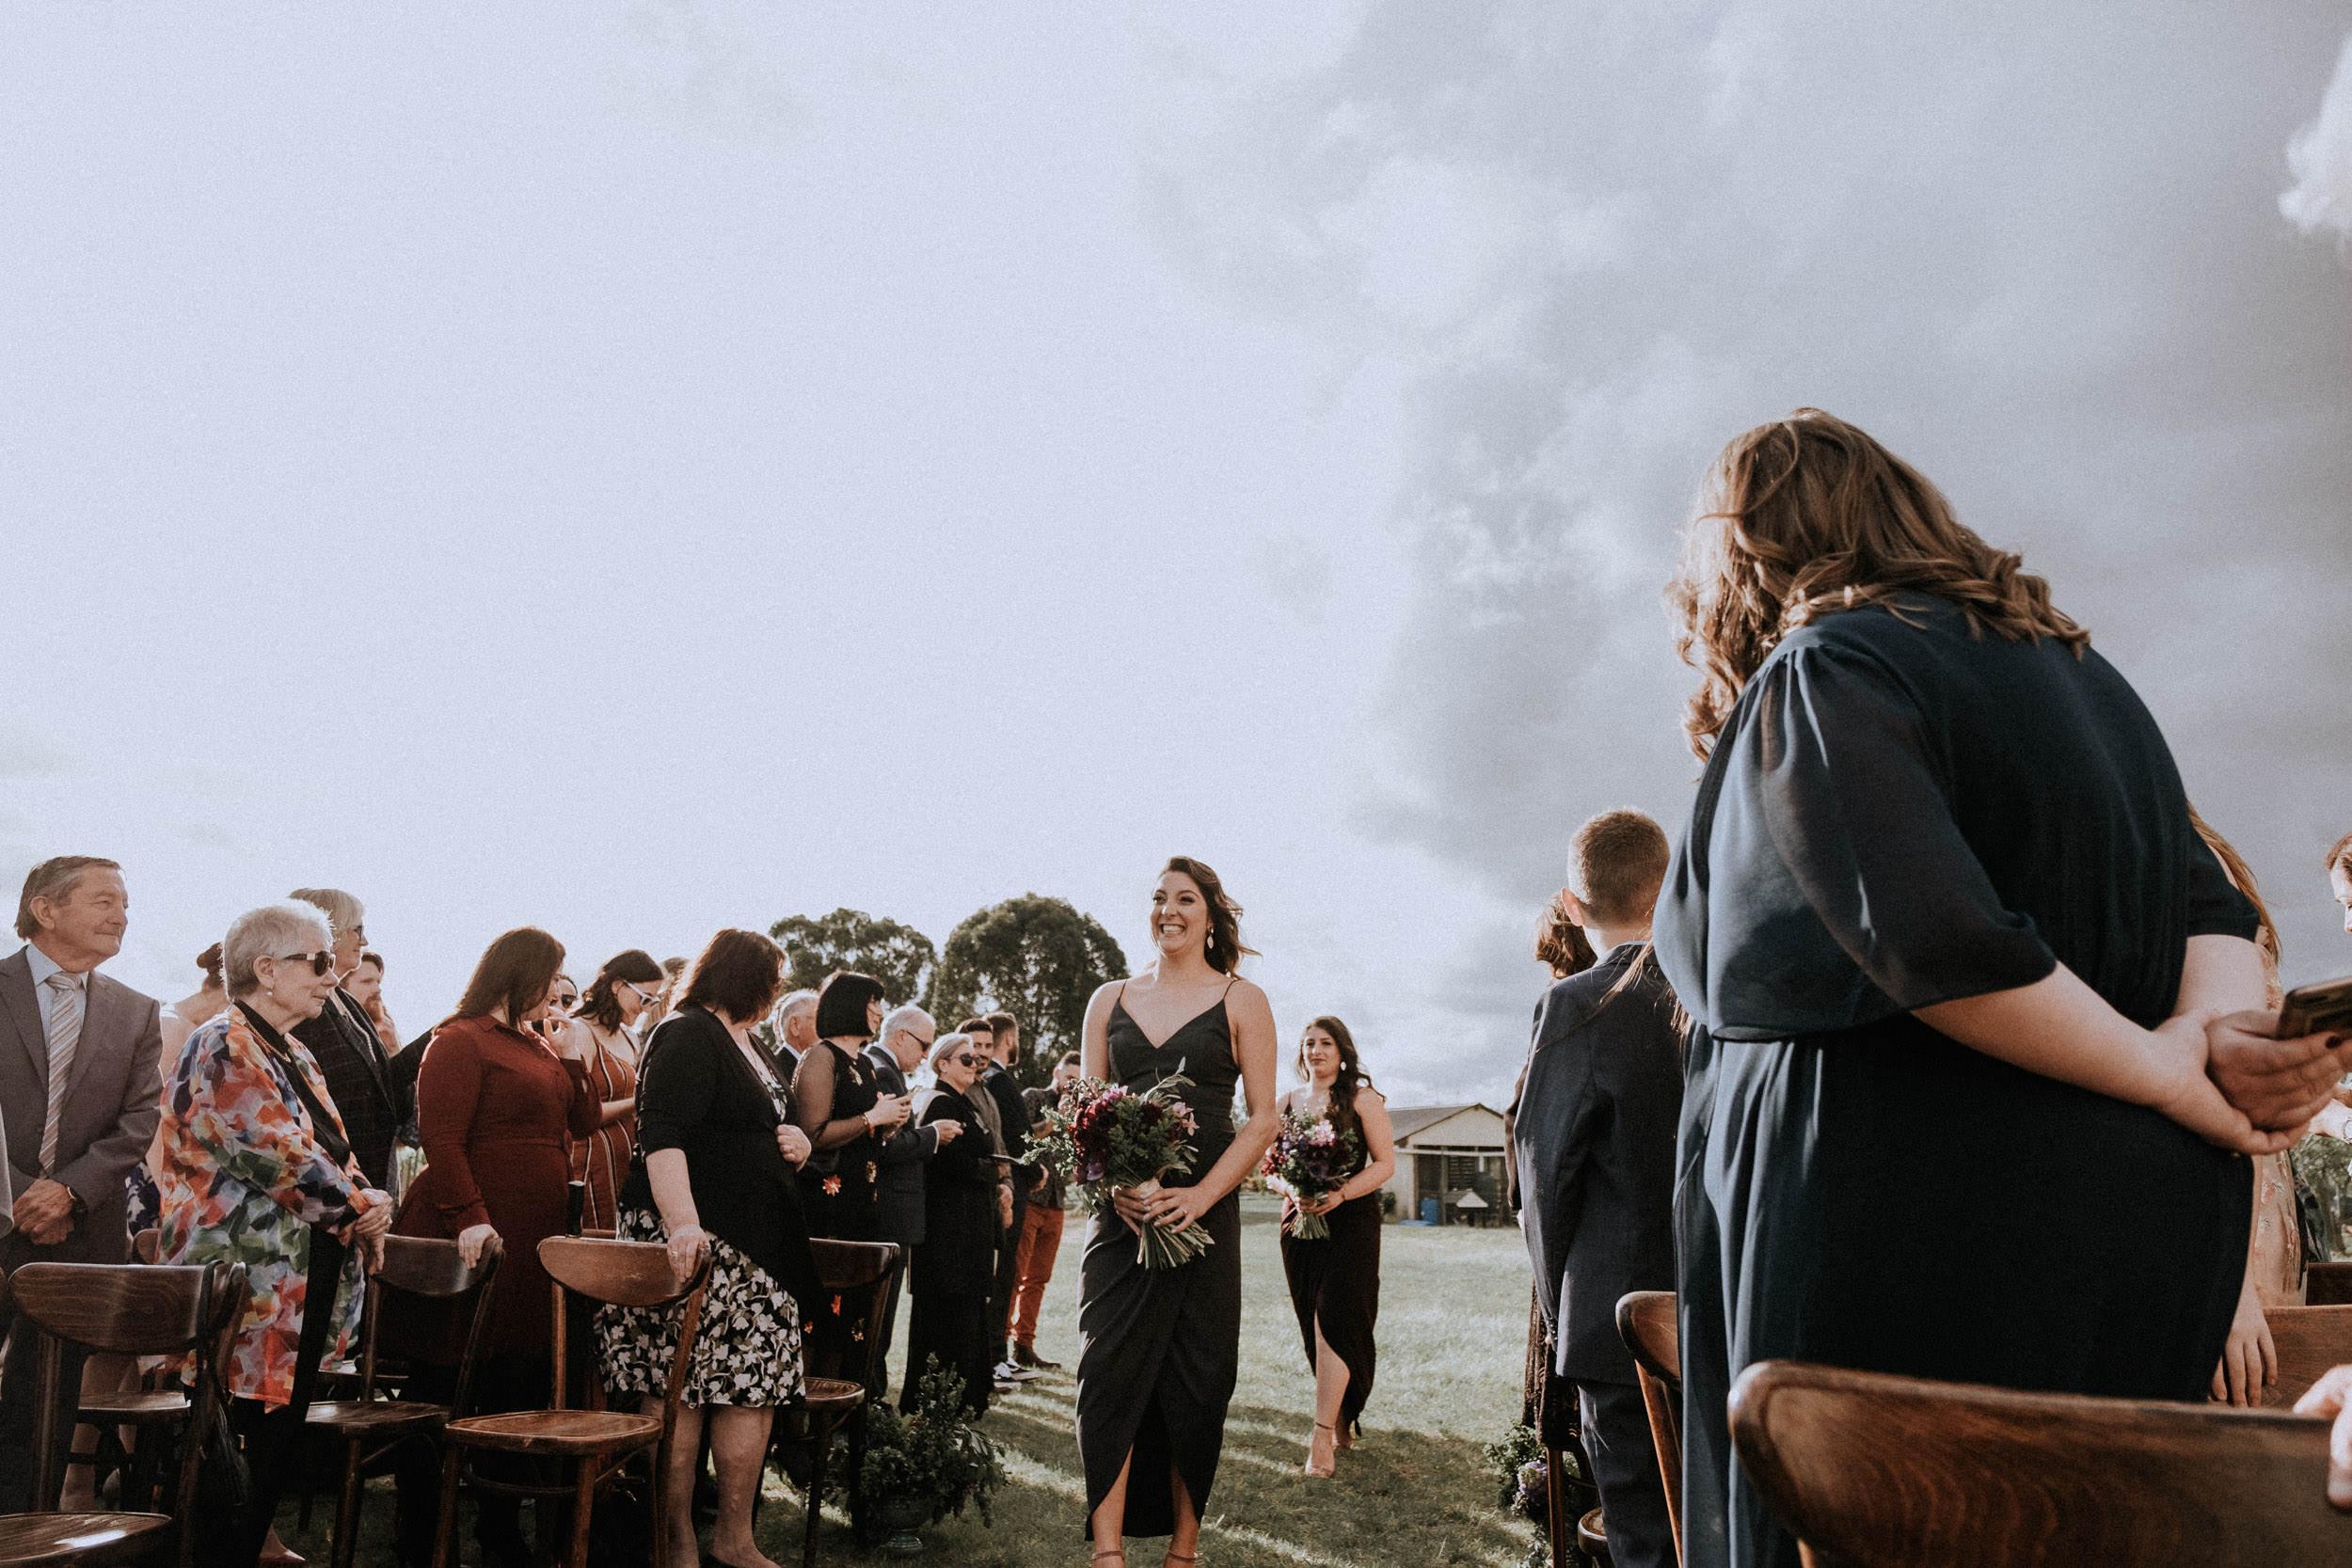 s+j_top_elopement wedding photography_kings & thieves_blog - 199.jpg